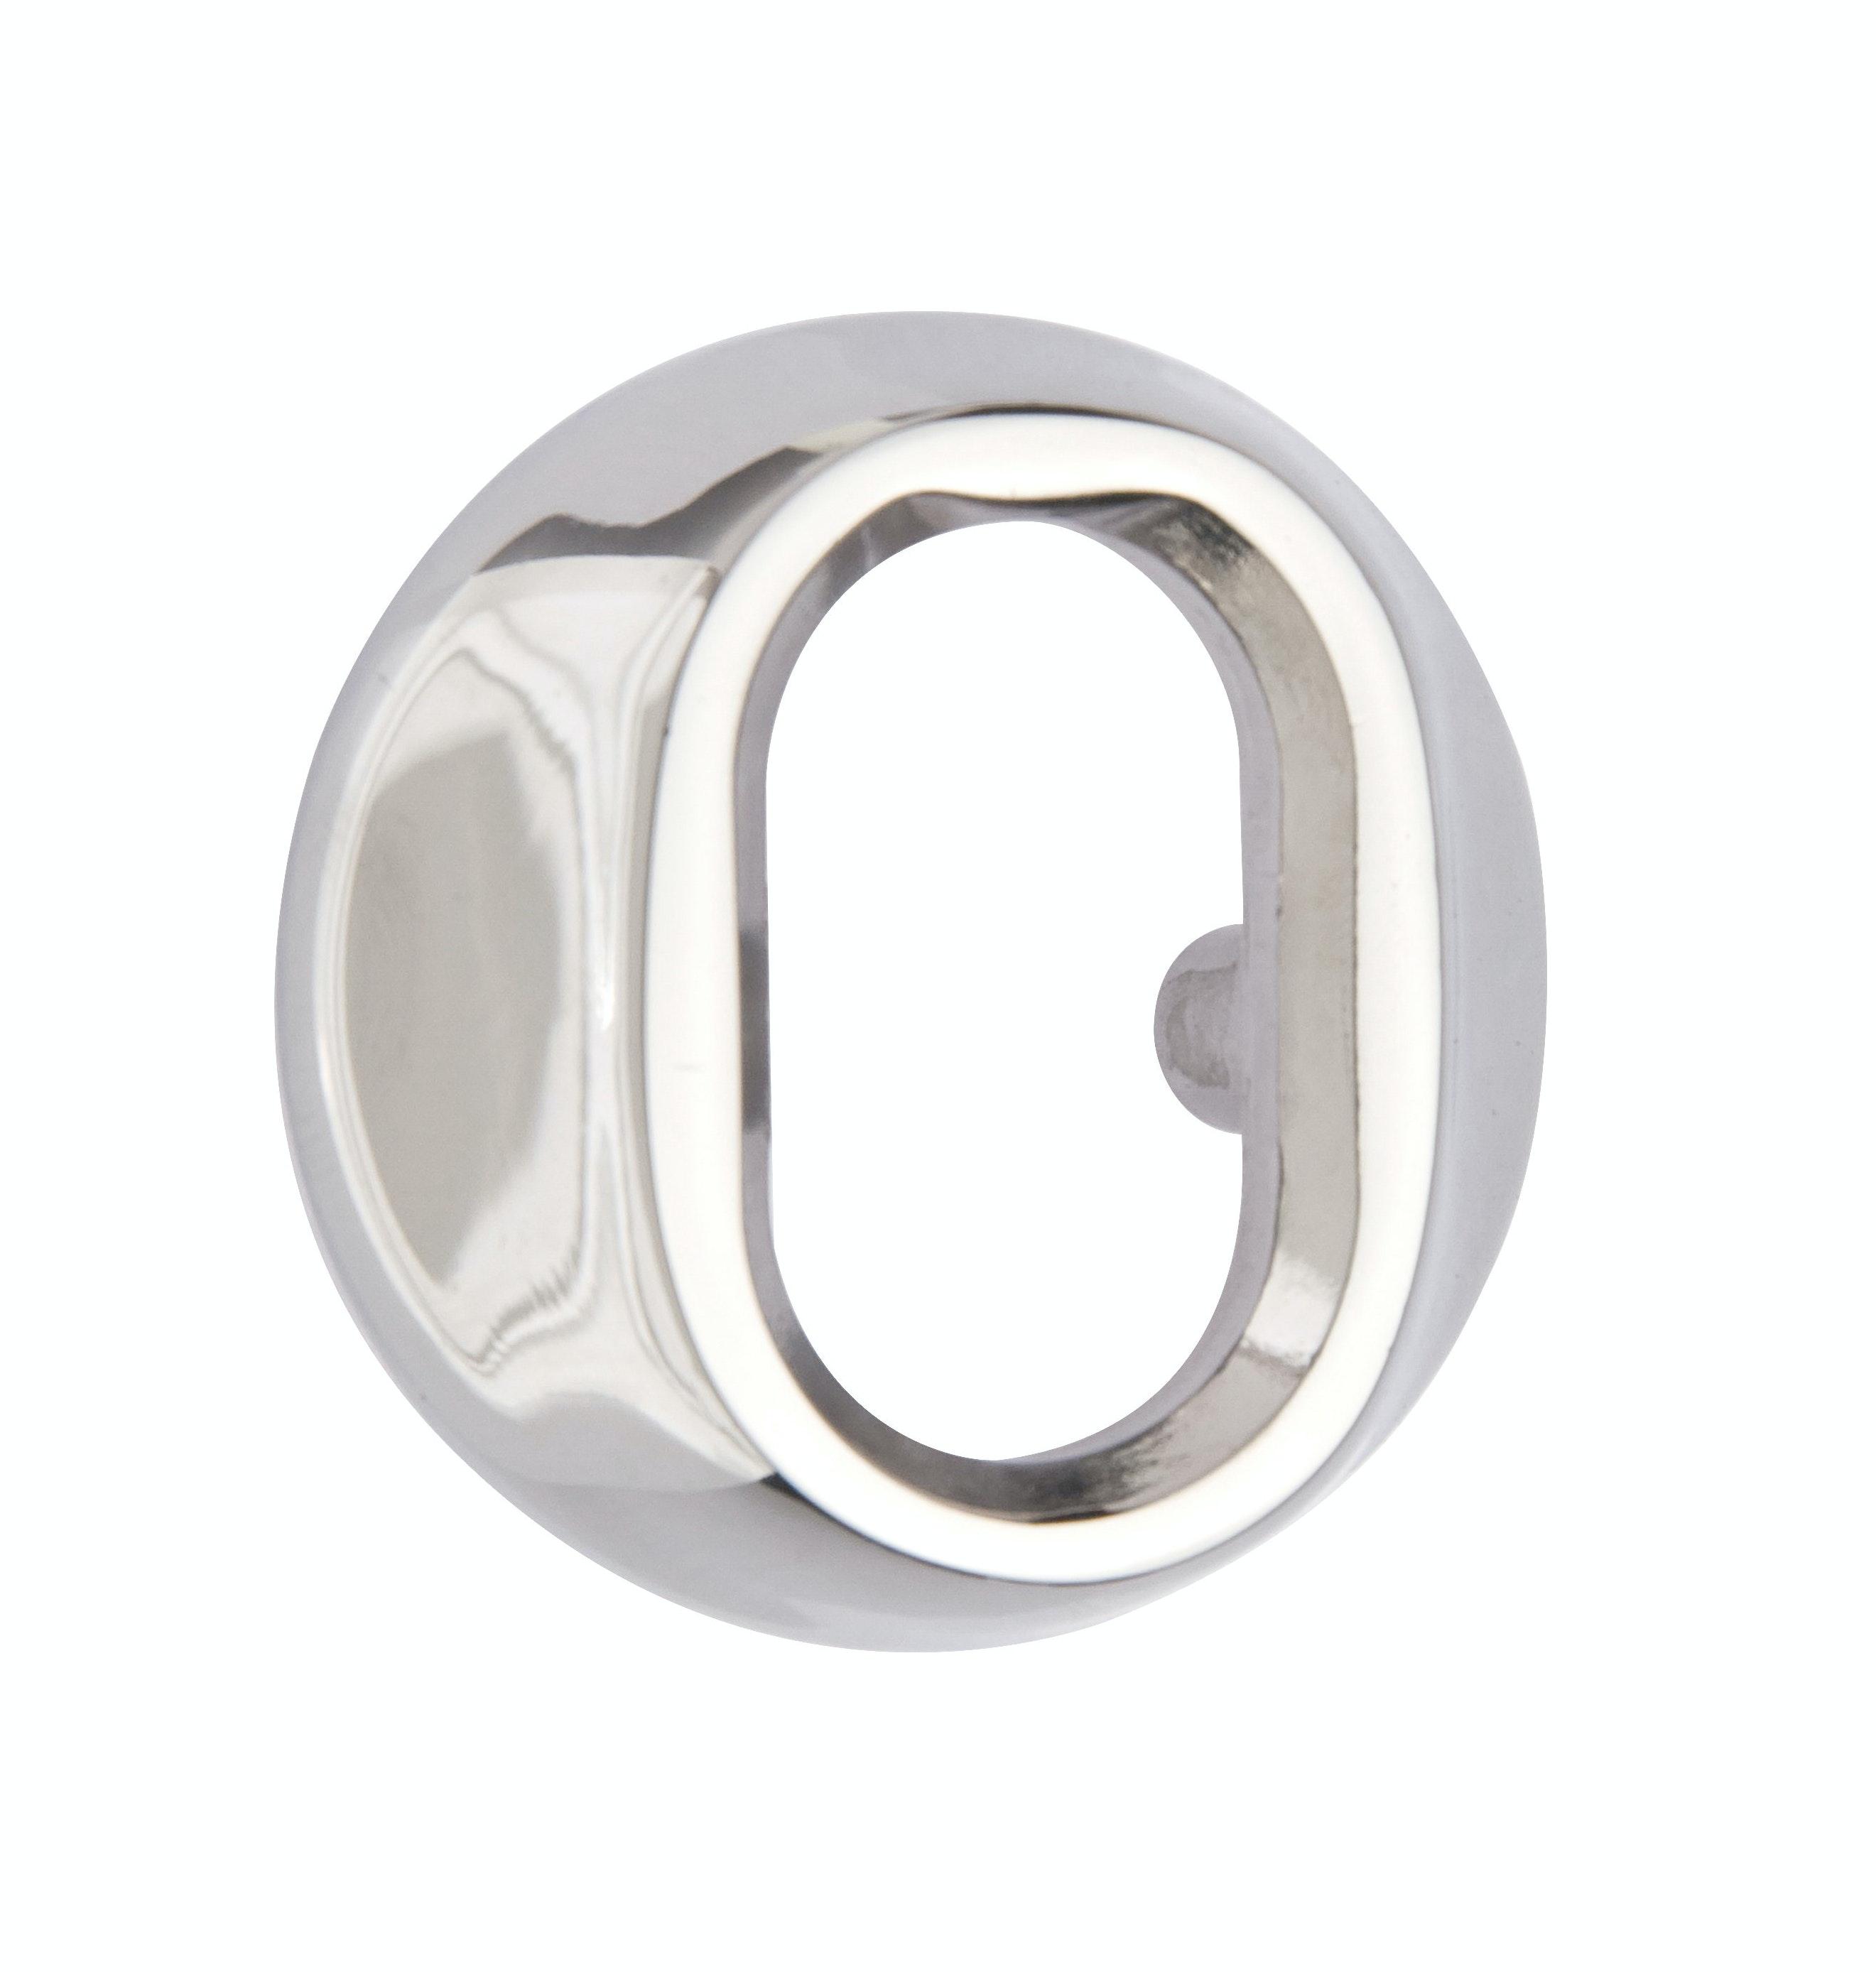 Cylinderring Assa 6-11mm Nickel